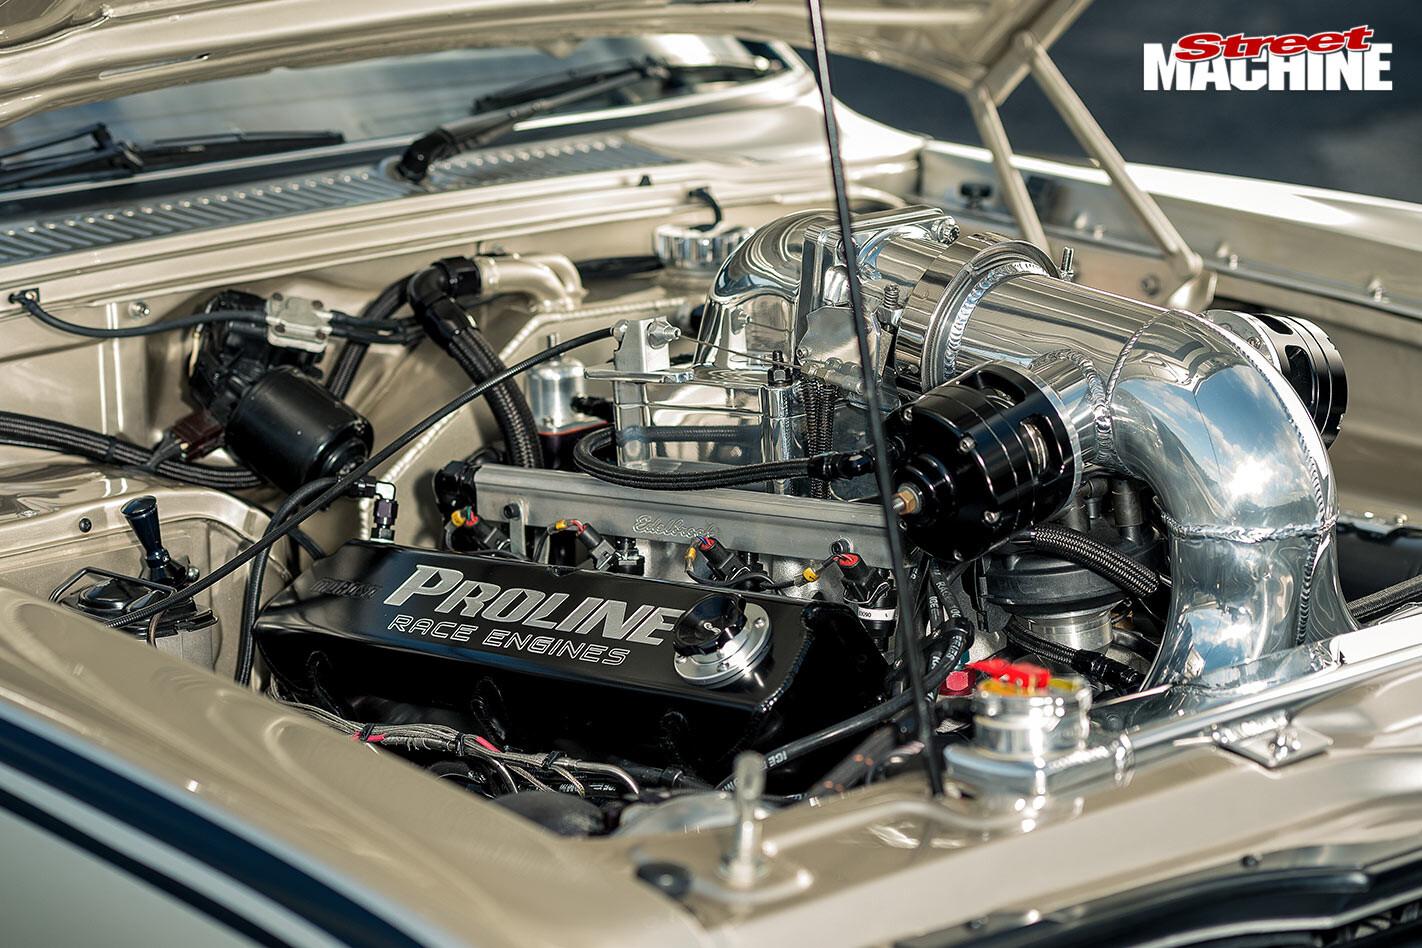 Ford TD Cortina engine